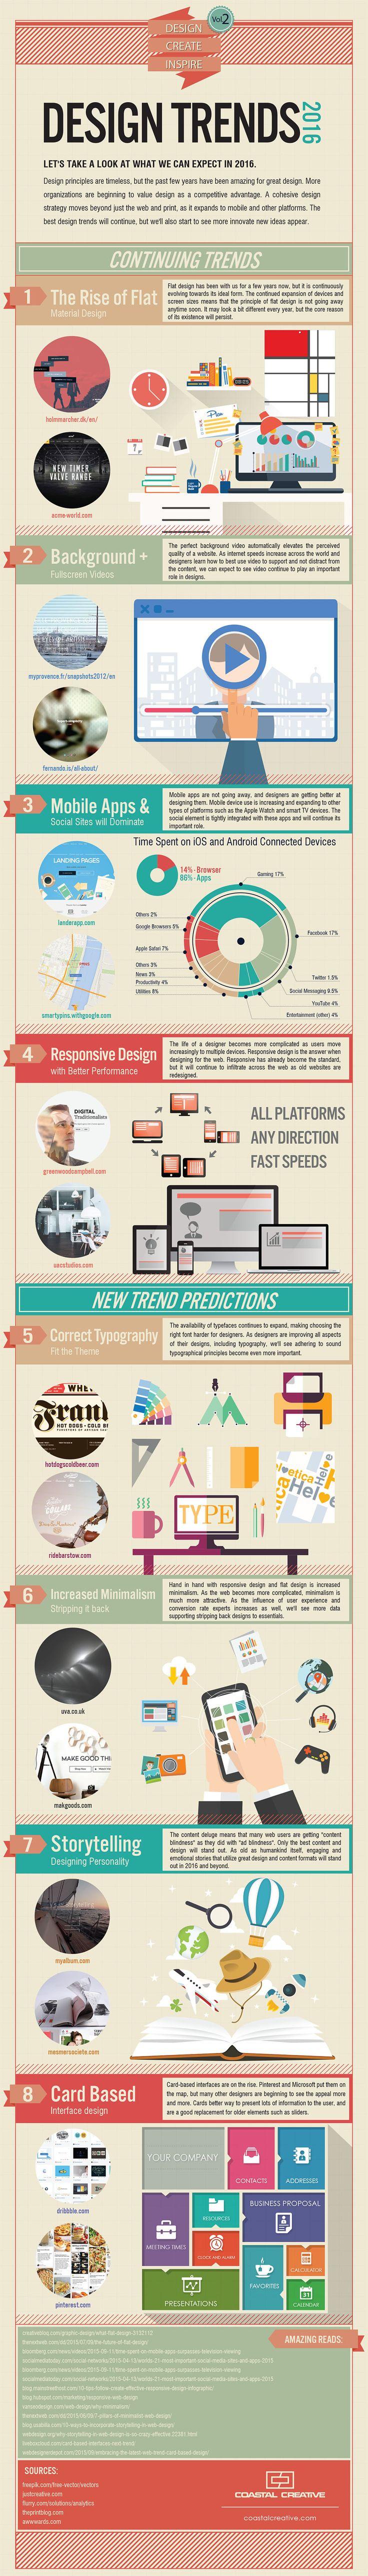 Web Design Trends 2016 - #infographic